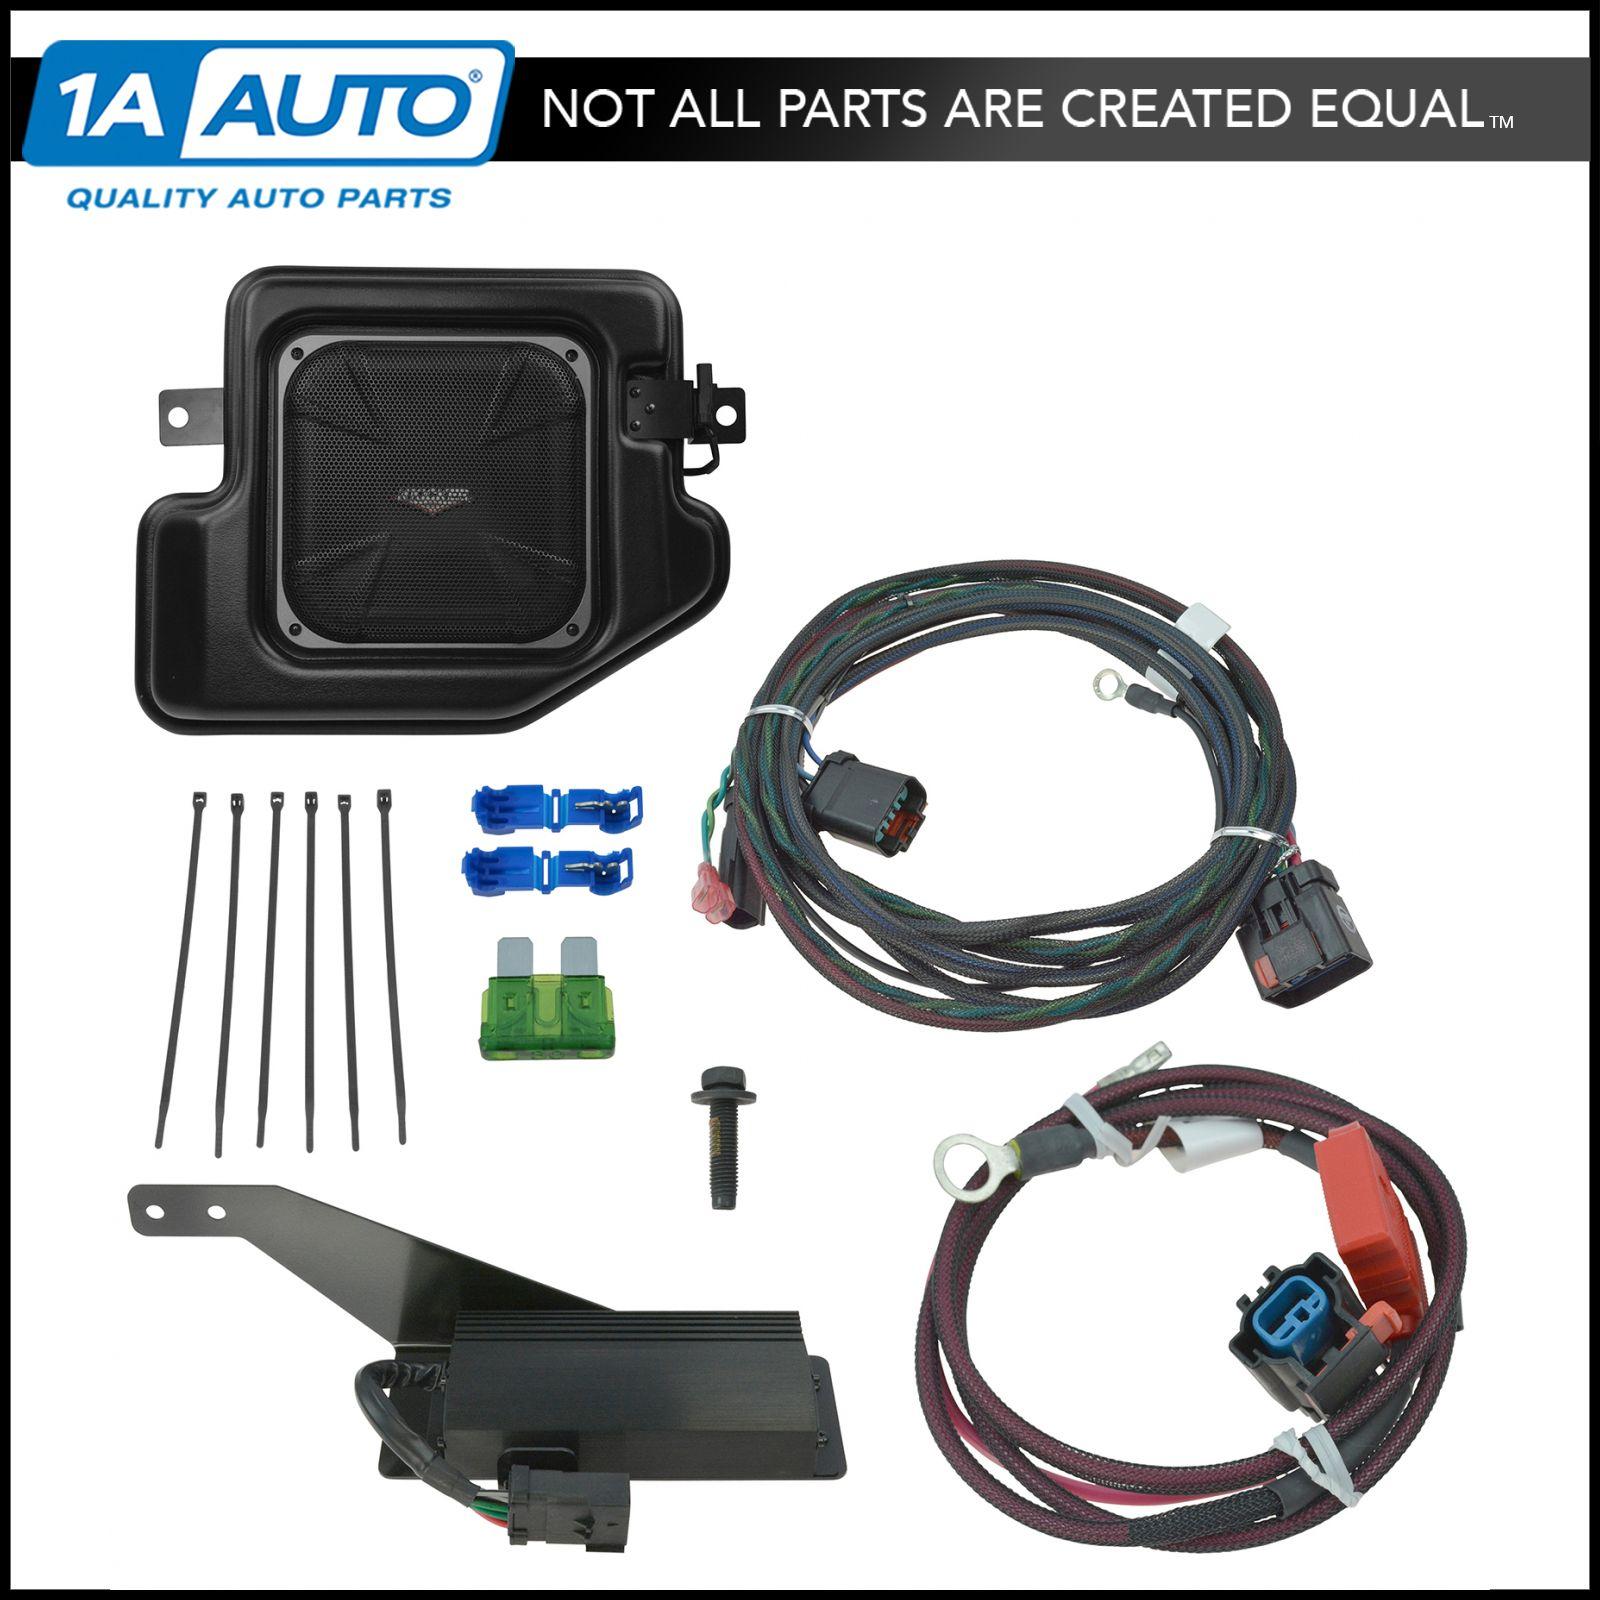 hight resolution of details about oem 77kick44 10 inch kicker subwoofer speaker kit for dodge ram pickup truck new